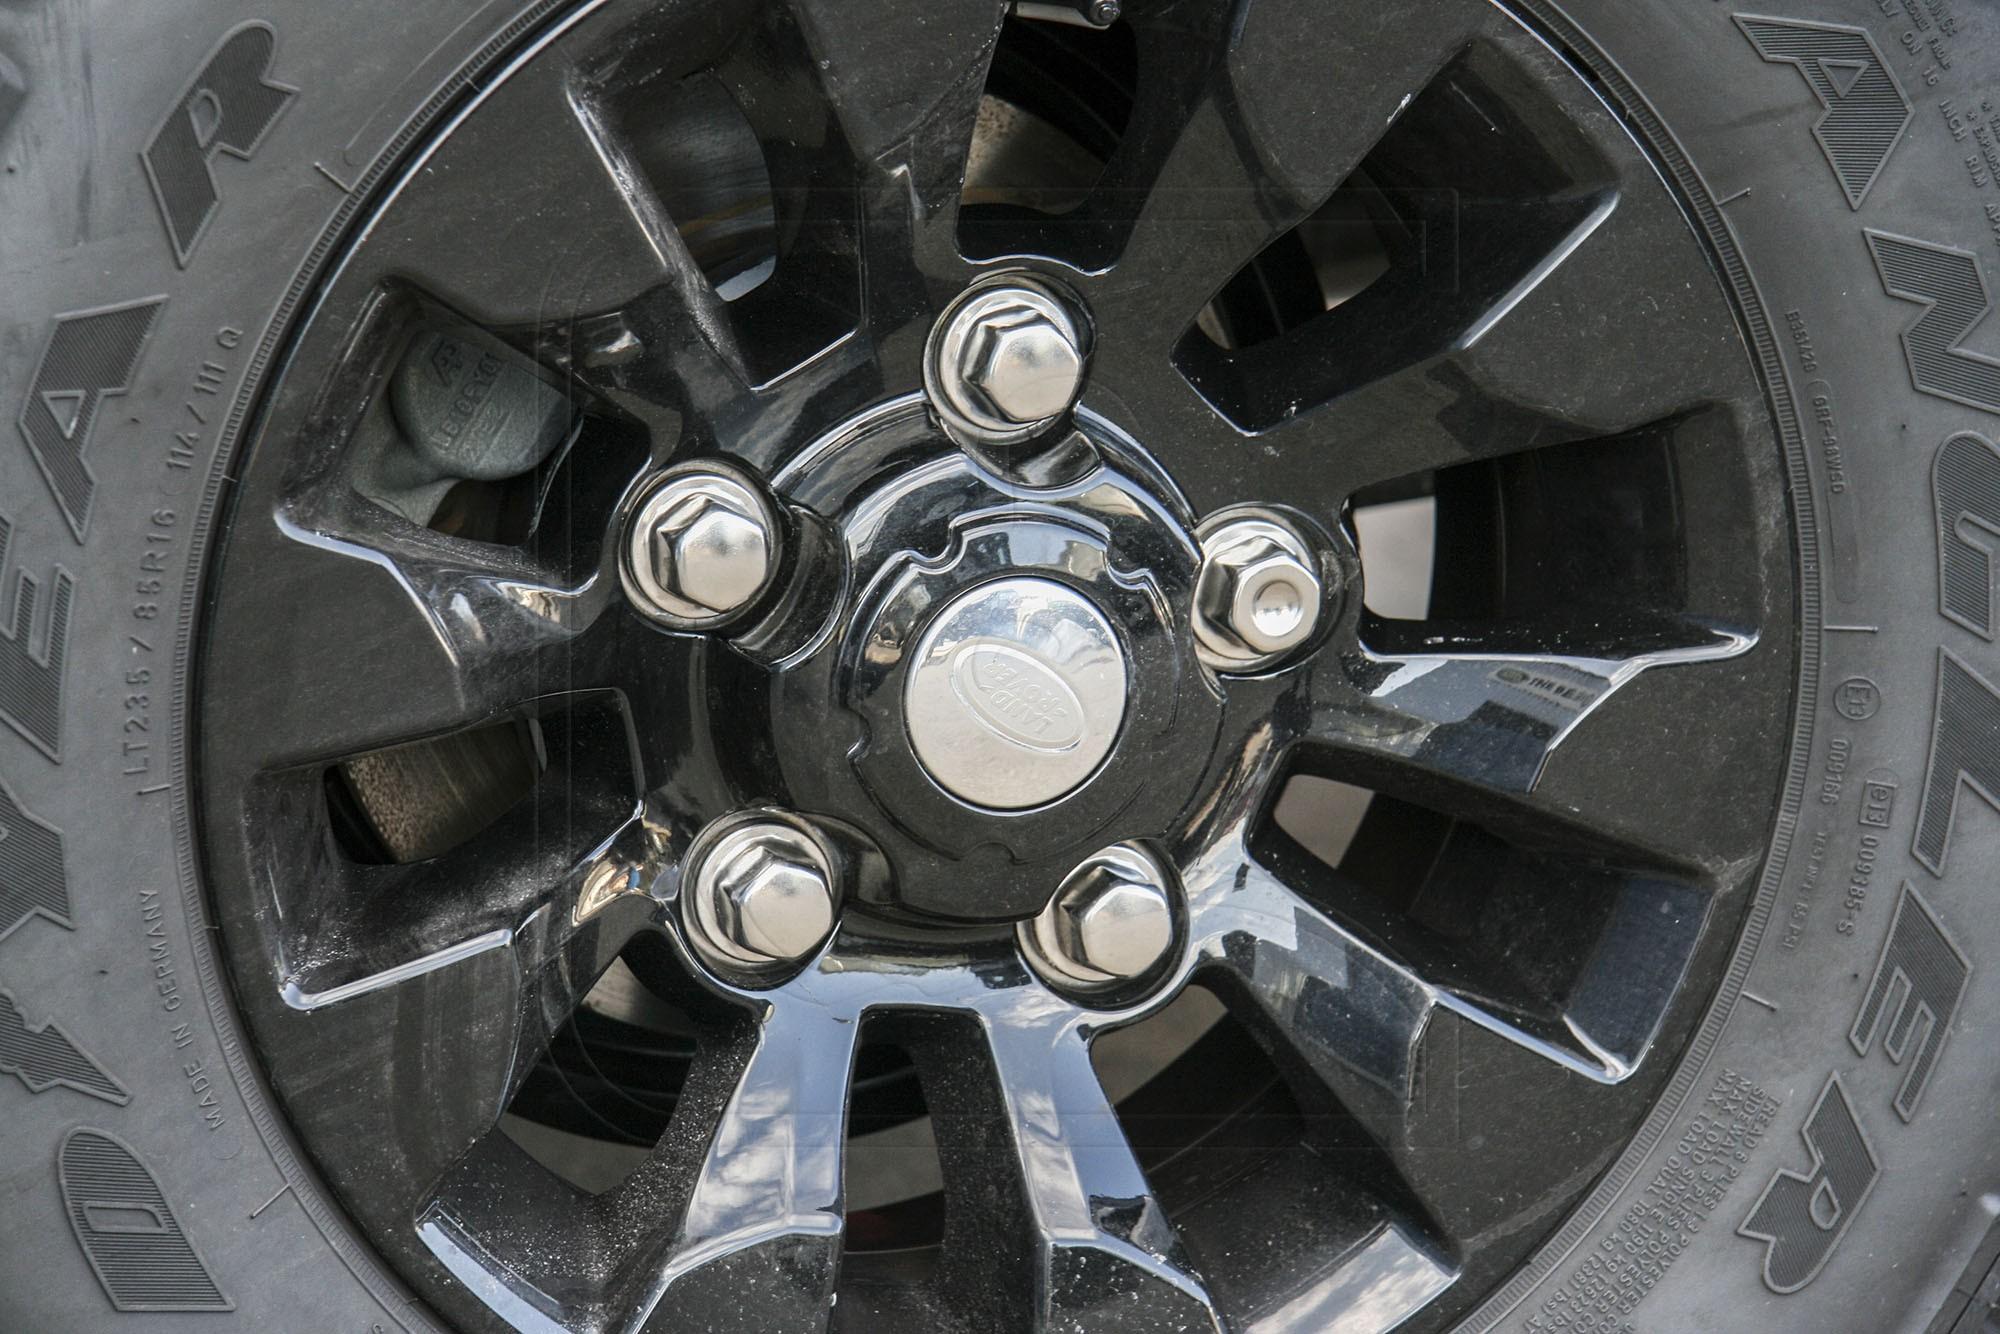 Wheel nut for alloy rim for Land Rover